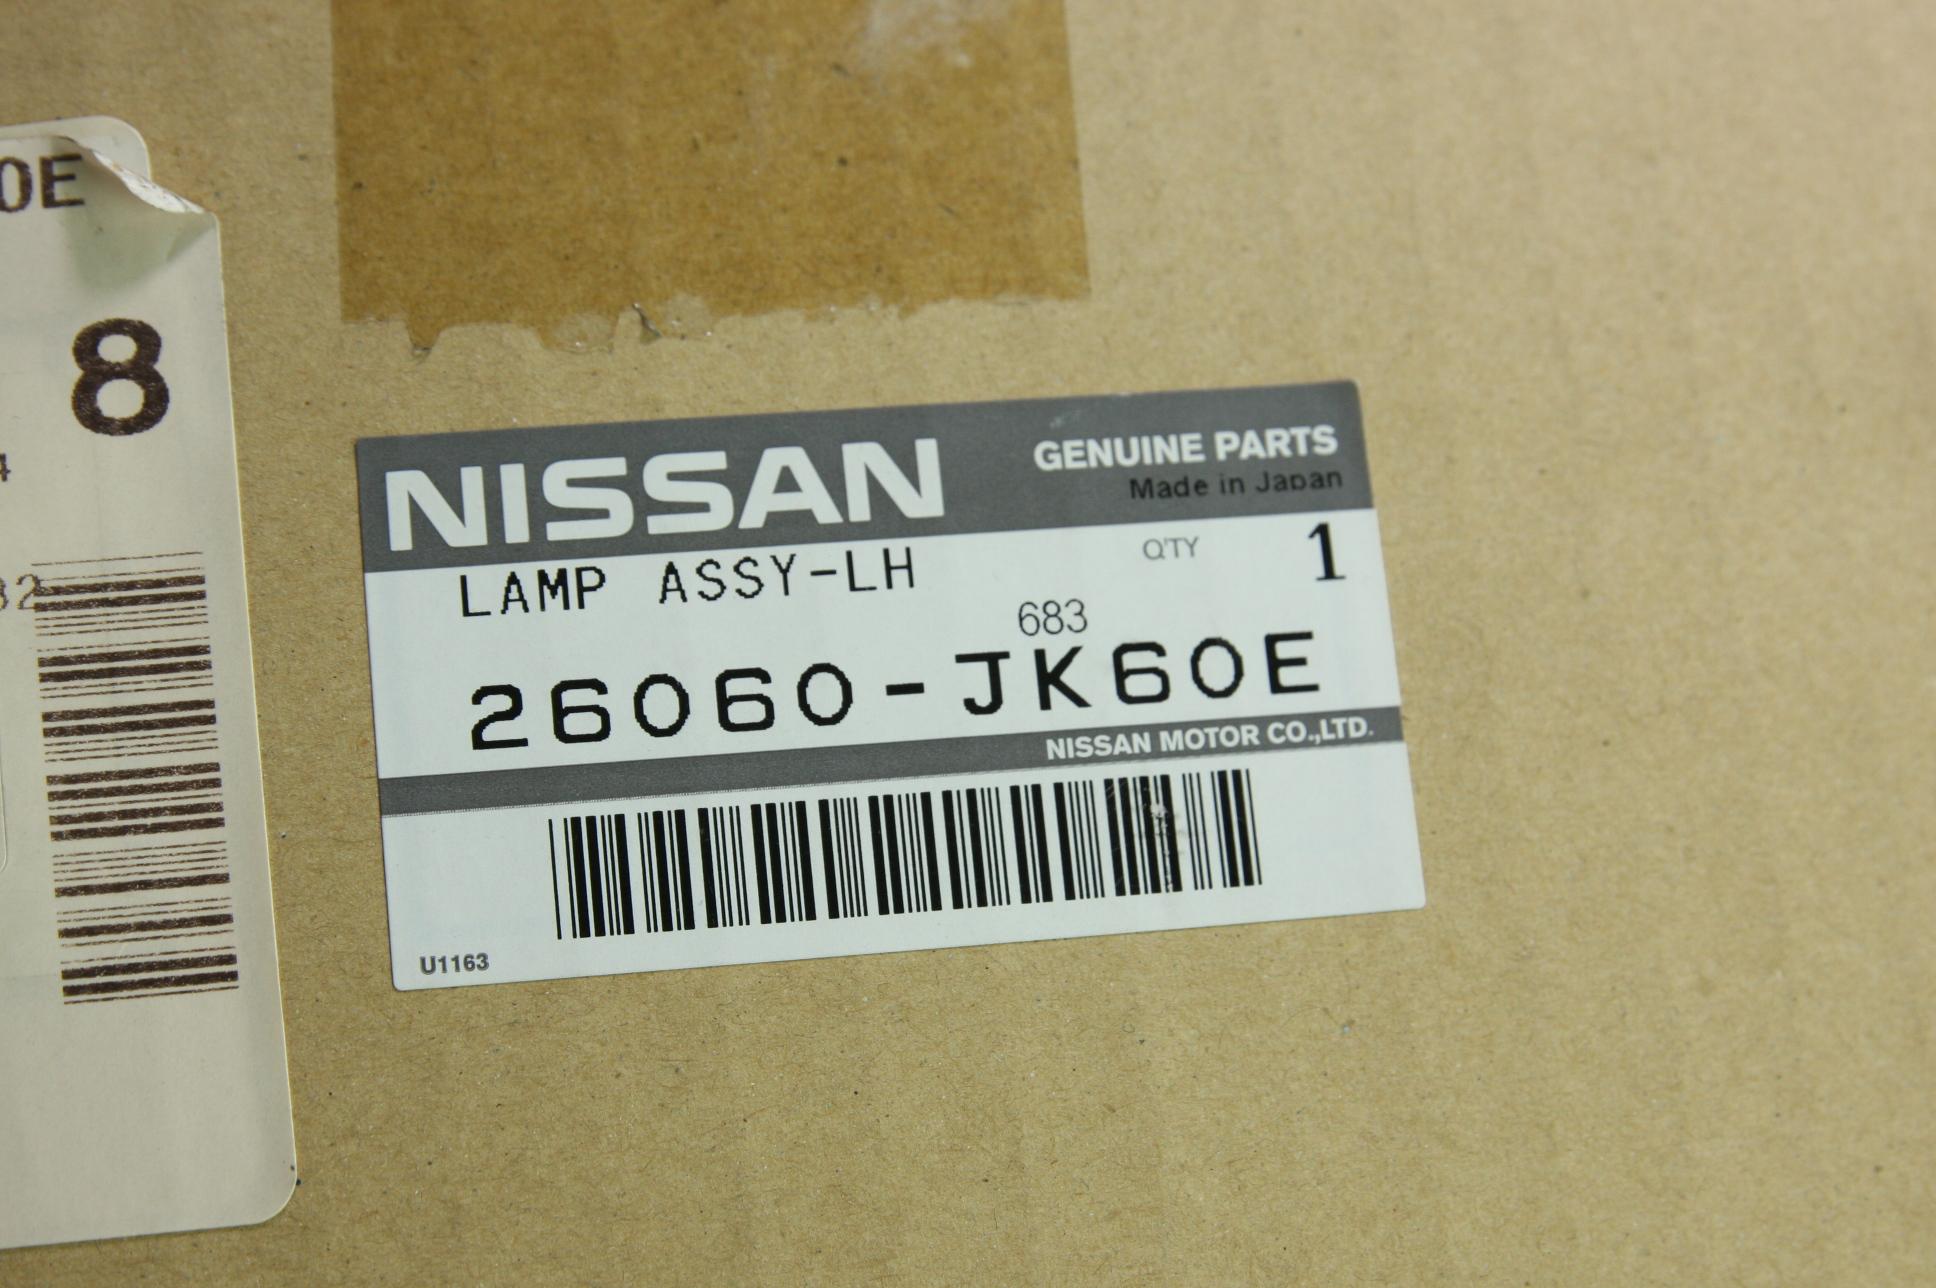 * Infiniti G37 Sedan Headlight LH Driver Side Genuine Nissan OEM 26060JK60E New - image 2